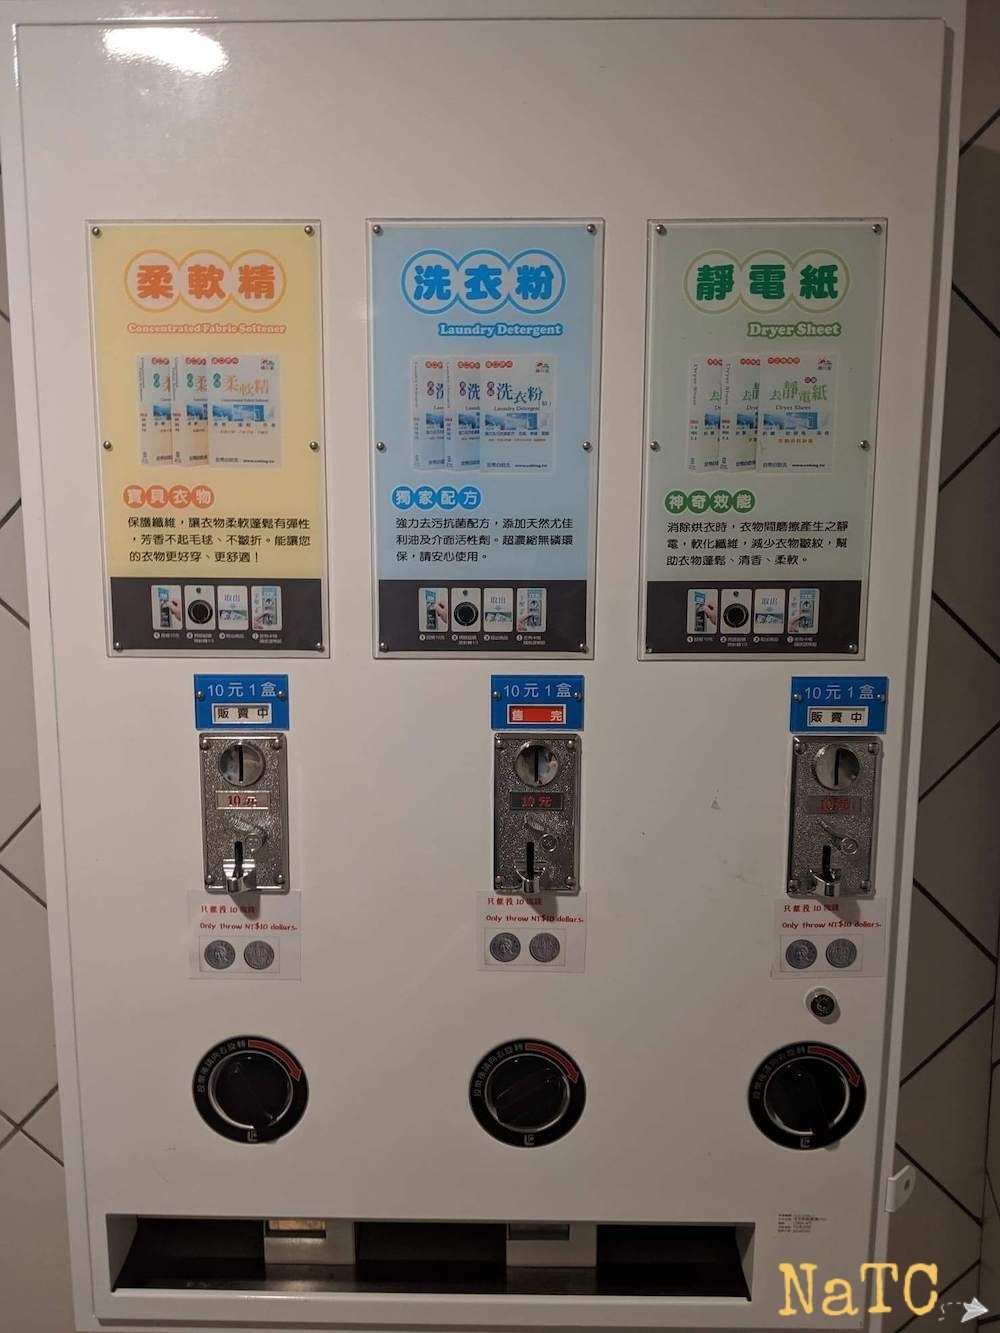 taipei laundry vending machine